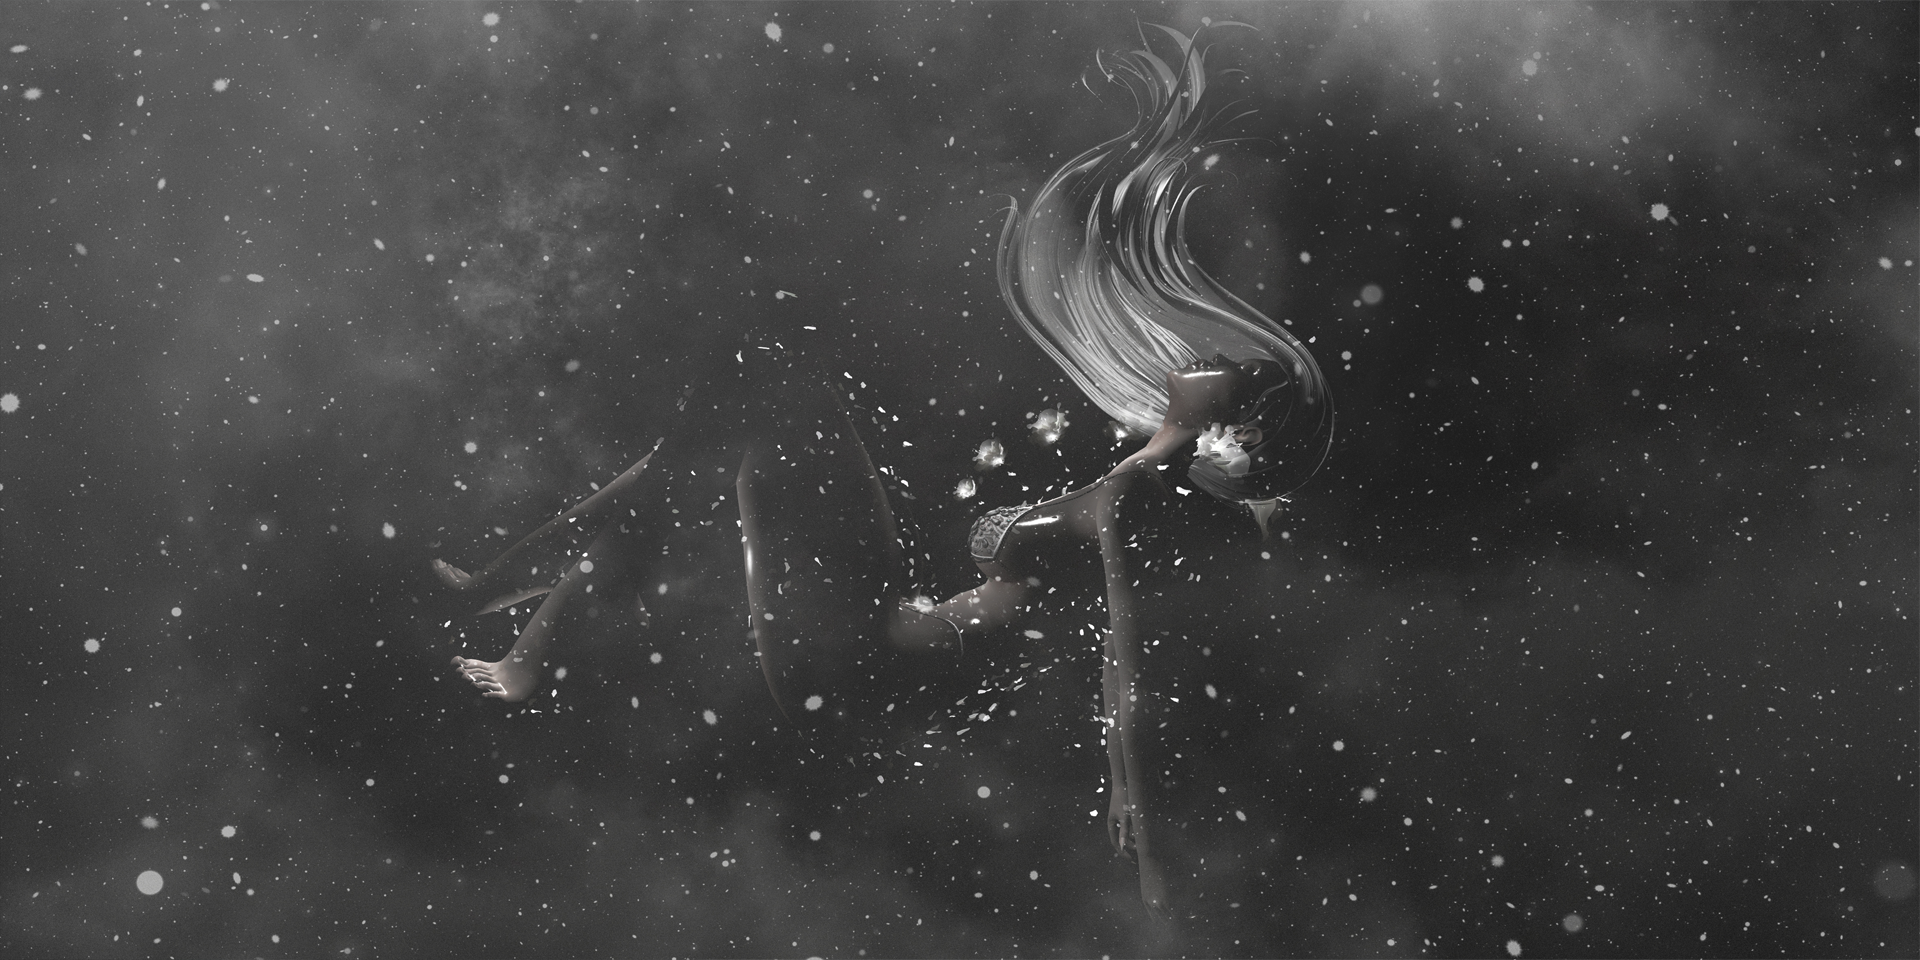 Blog | Ticha Blabla | nouvelles érotiques | Second Life | art numerique